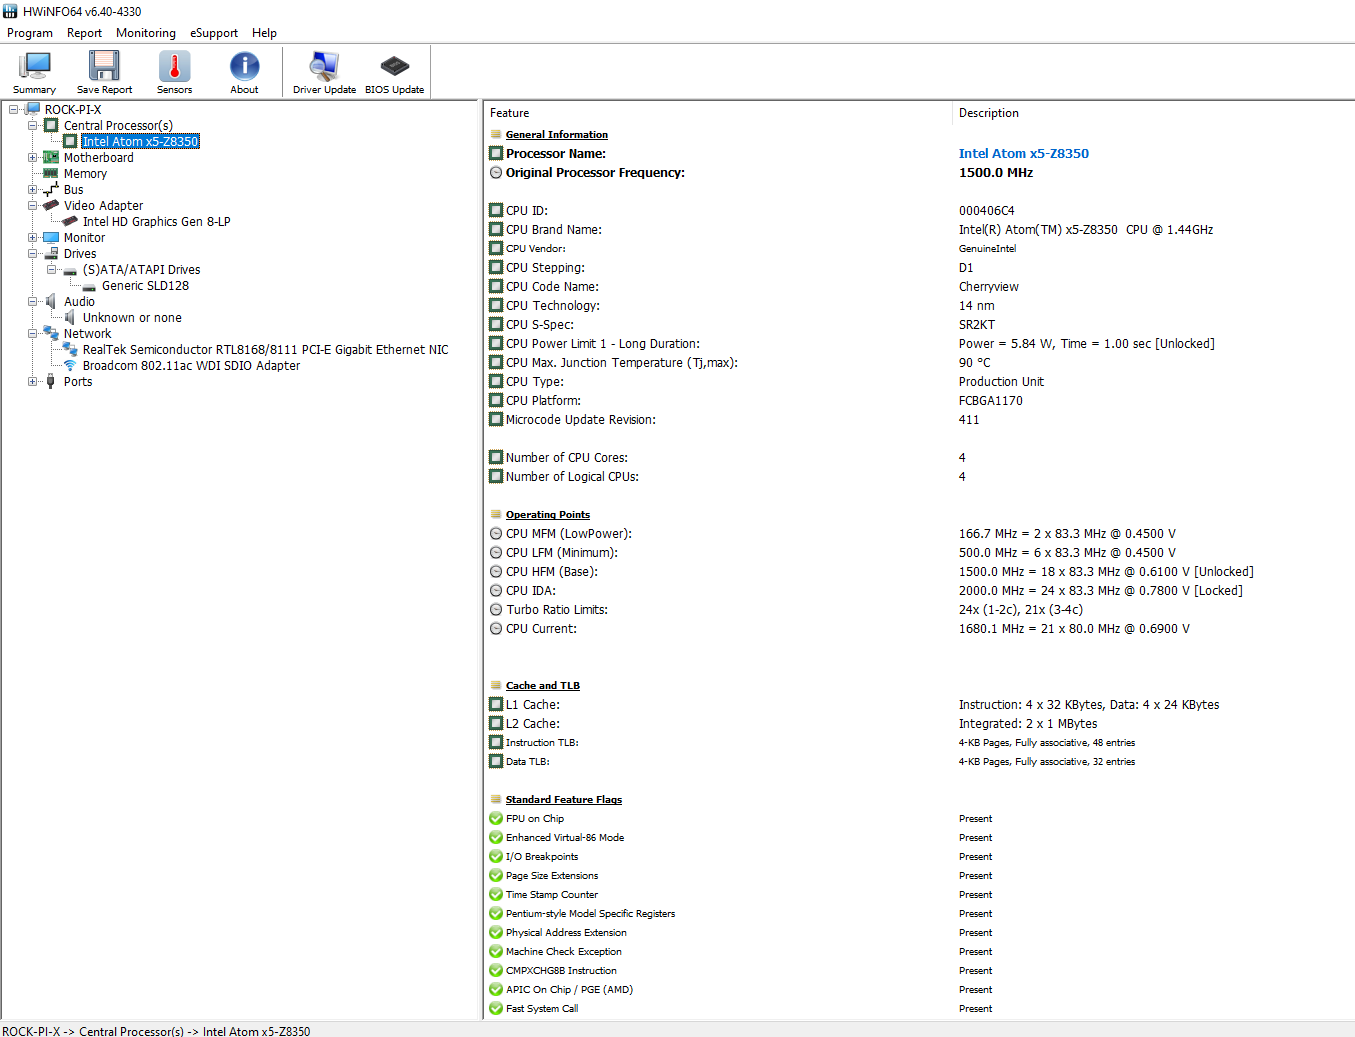 hwinfo64 windows configuration